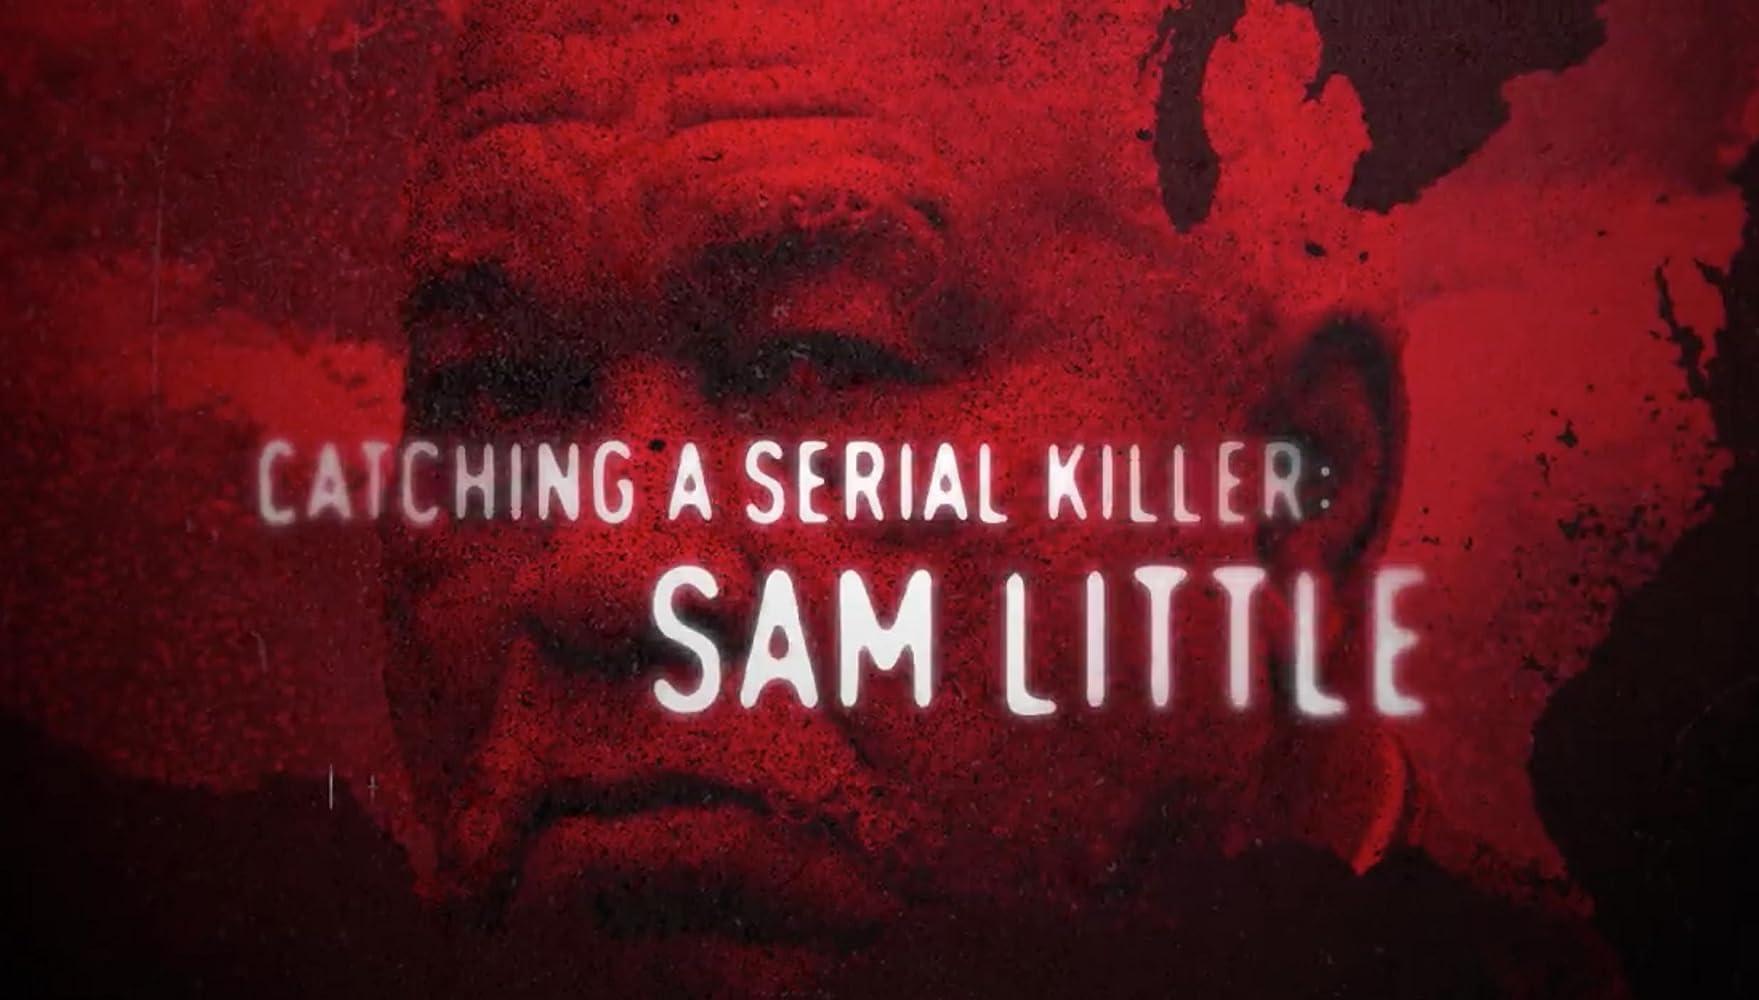 Catching a Serial Killer: Sam Little